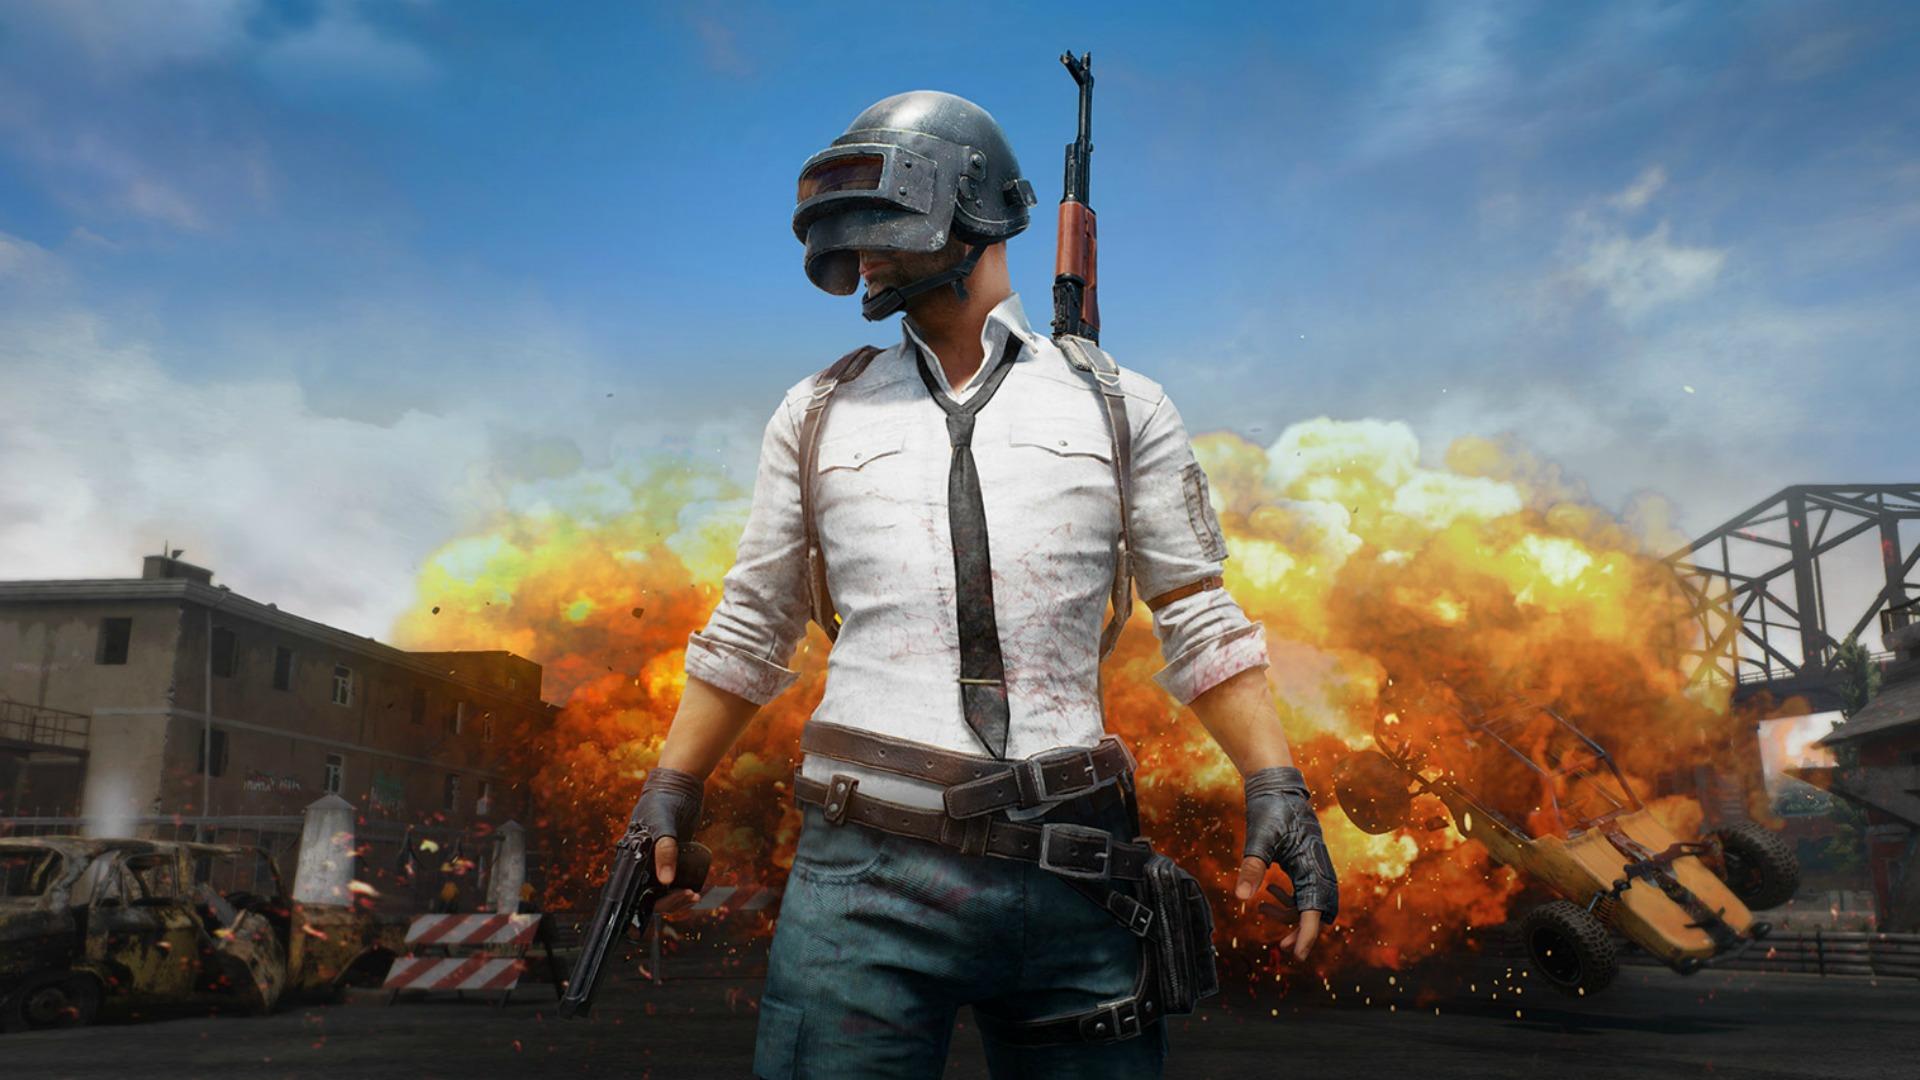 Pubg Creator Calls Out Streamer For Violent Joke Gaming Trend